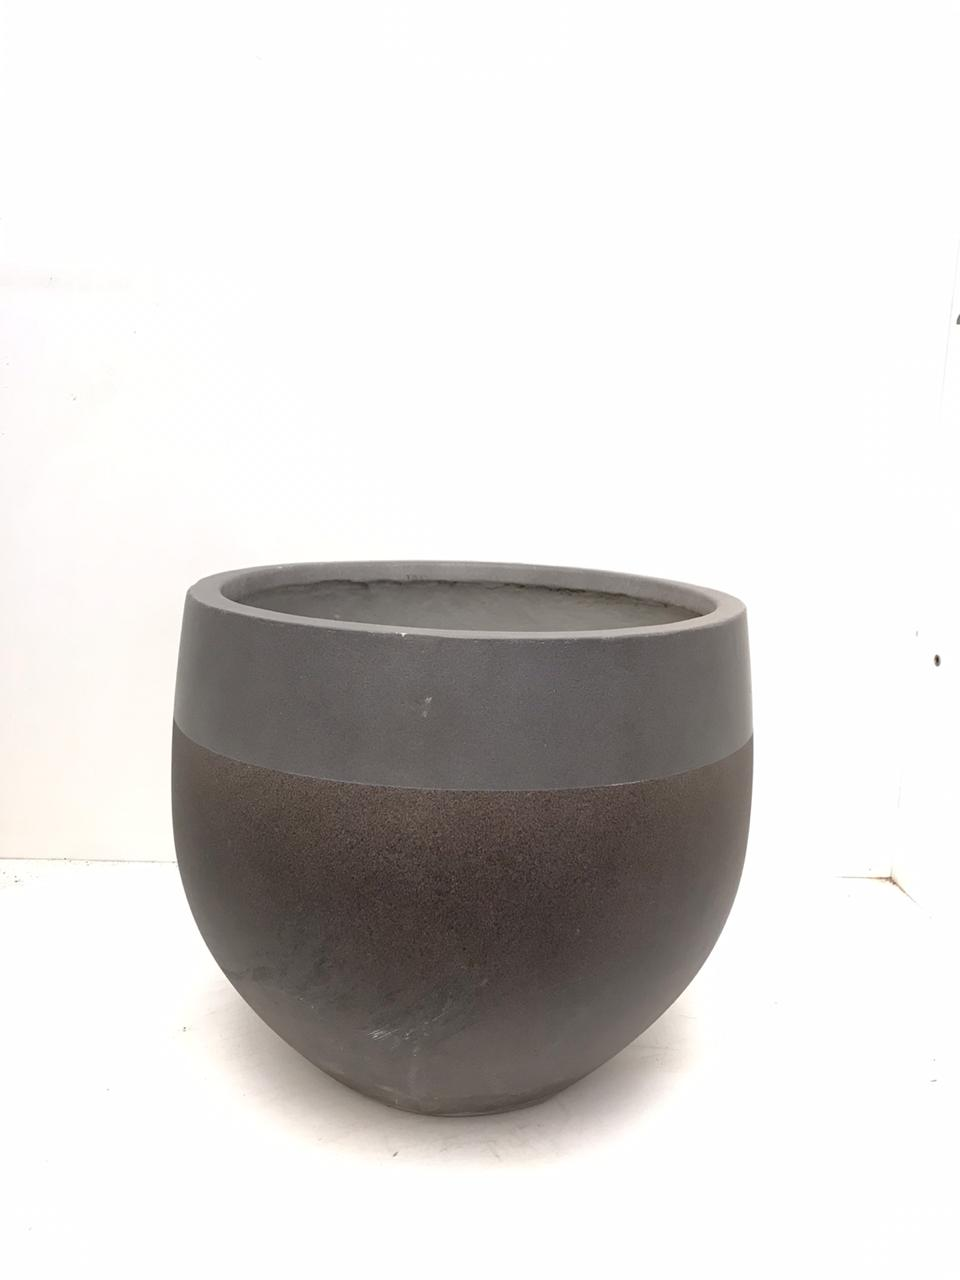 Round Three Quarters Beige Pot - Large Pots & Vases